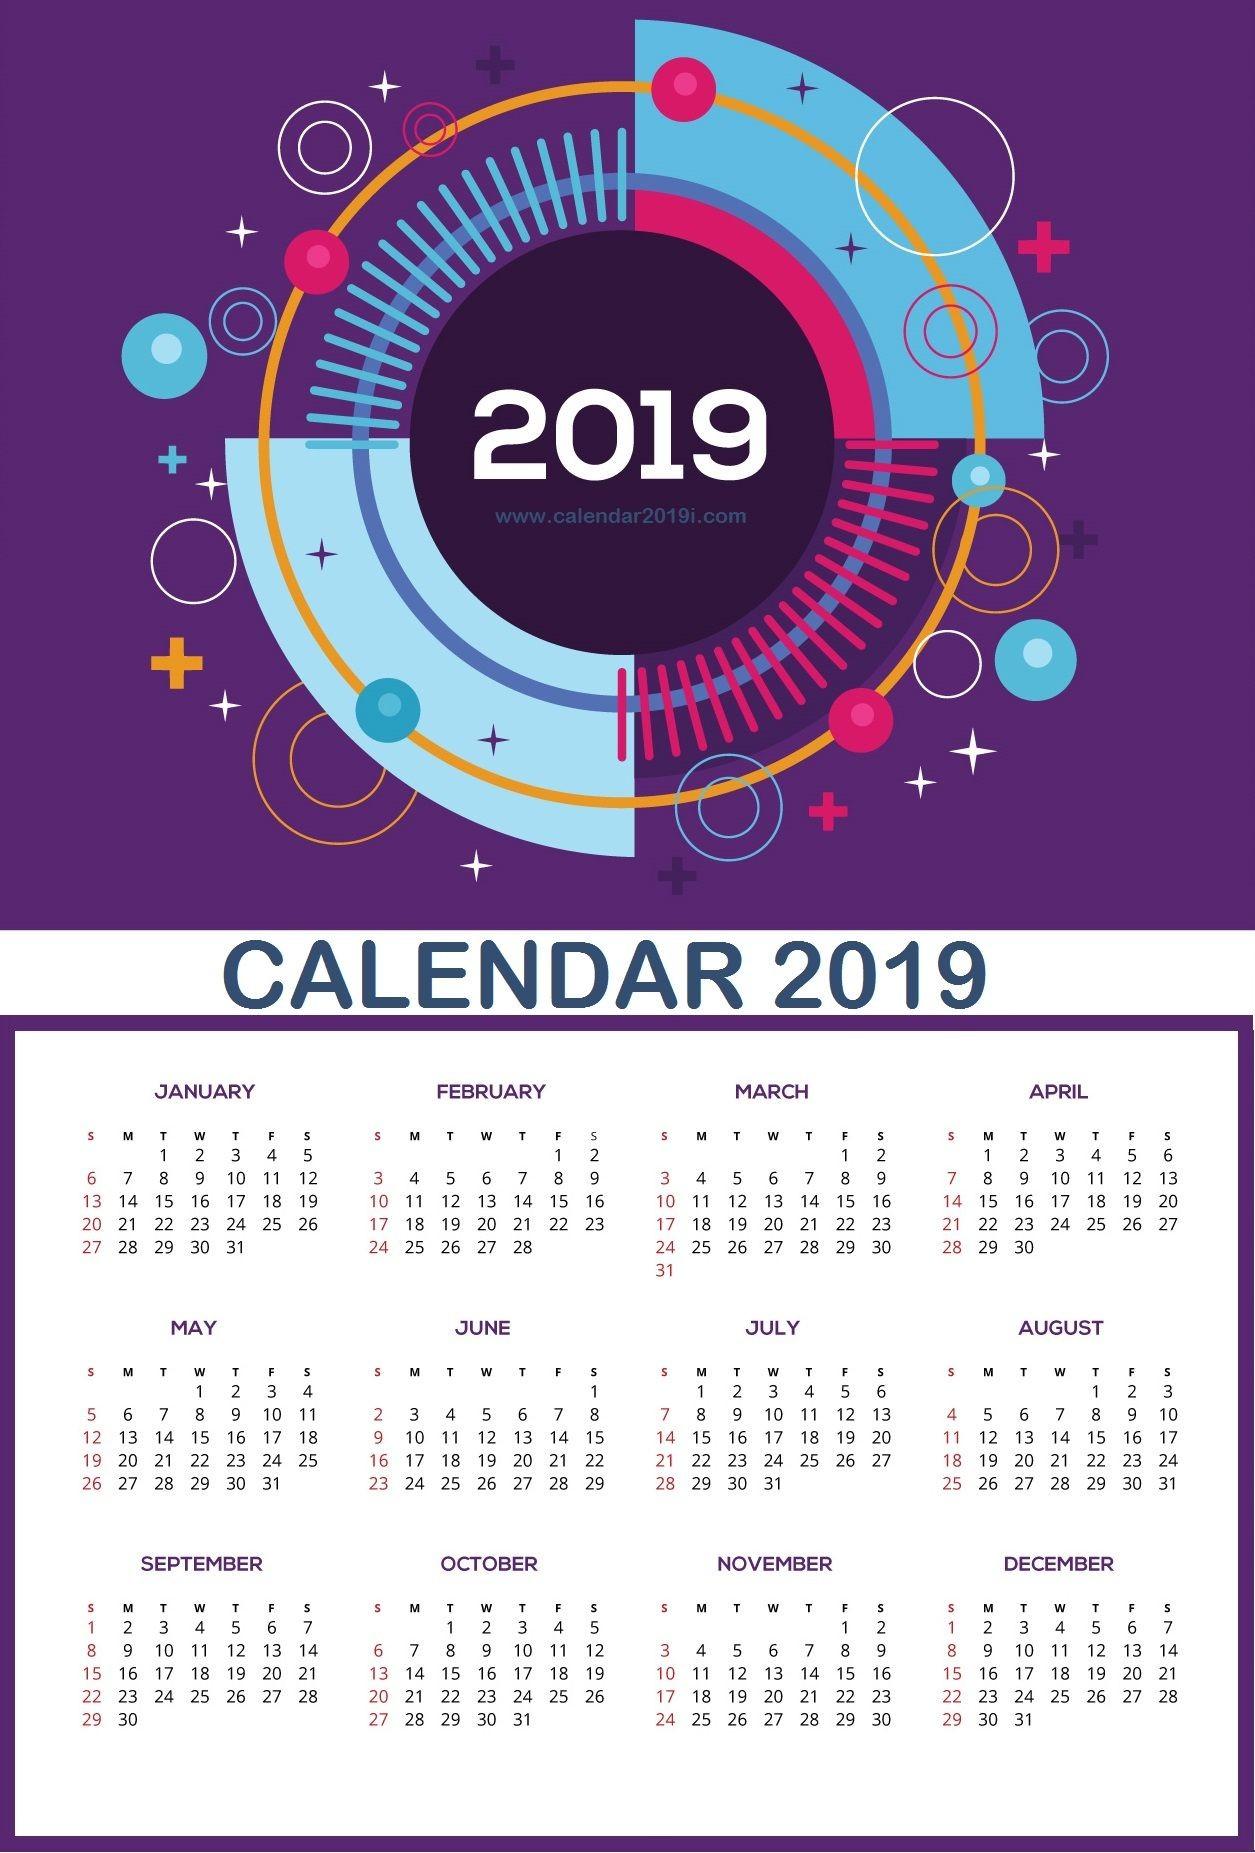 Calendar 2019 to Download Recientes Wall Calendar 2019 Planner Pinterest Of Calendar 2019 to Download Actual Calendar Template Google Sheets 2019